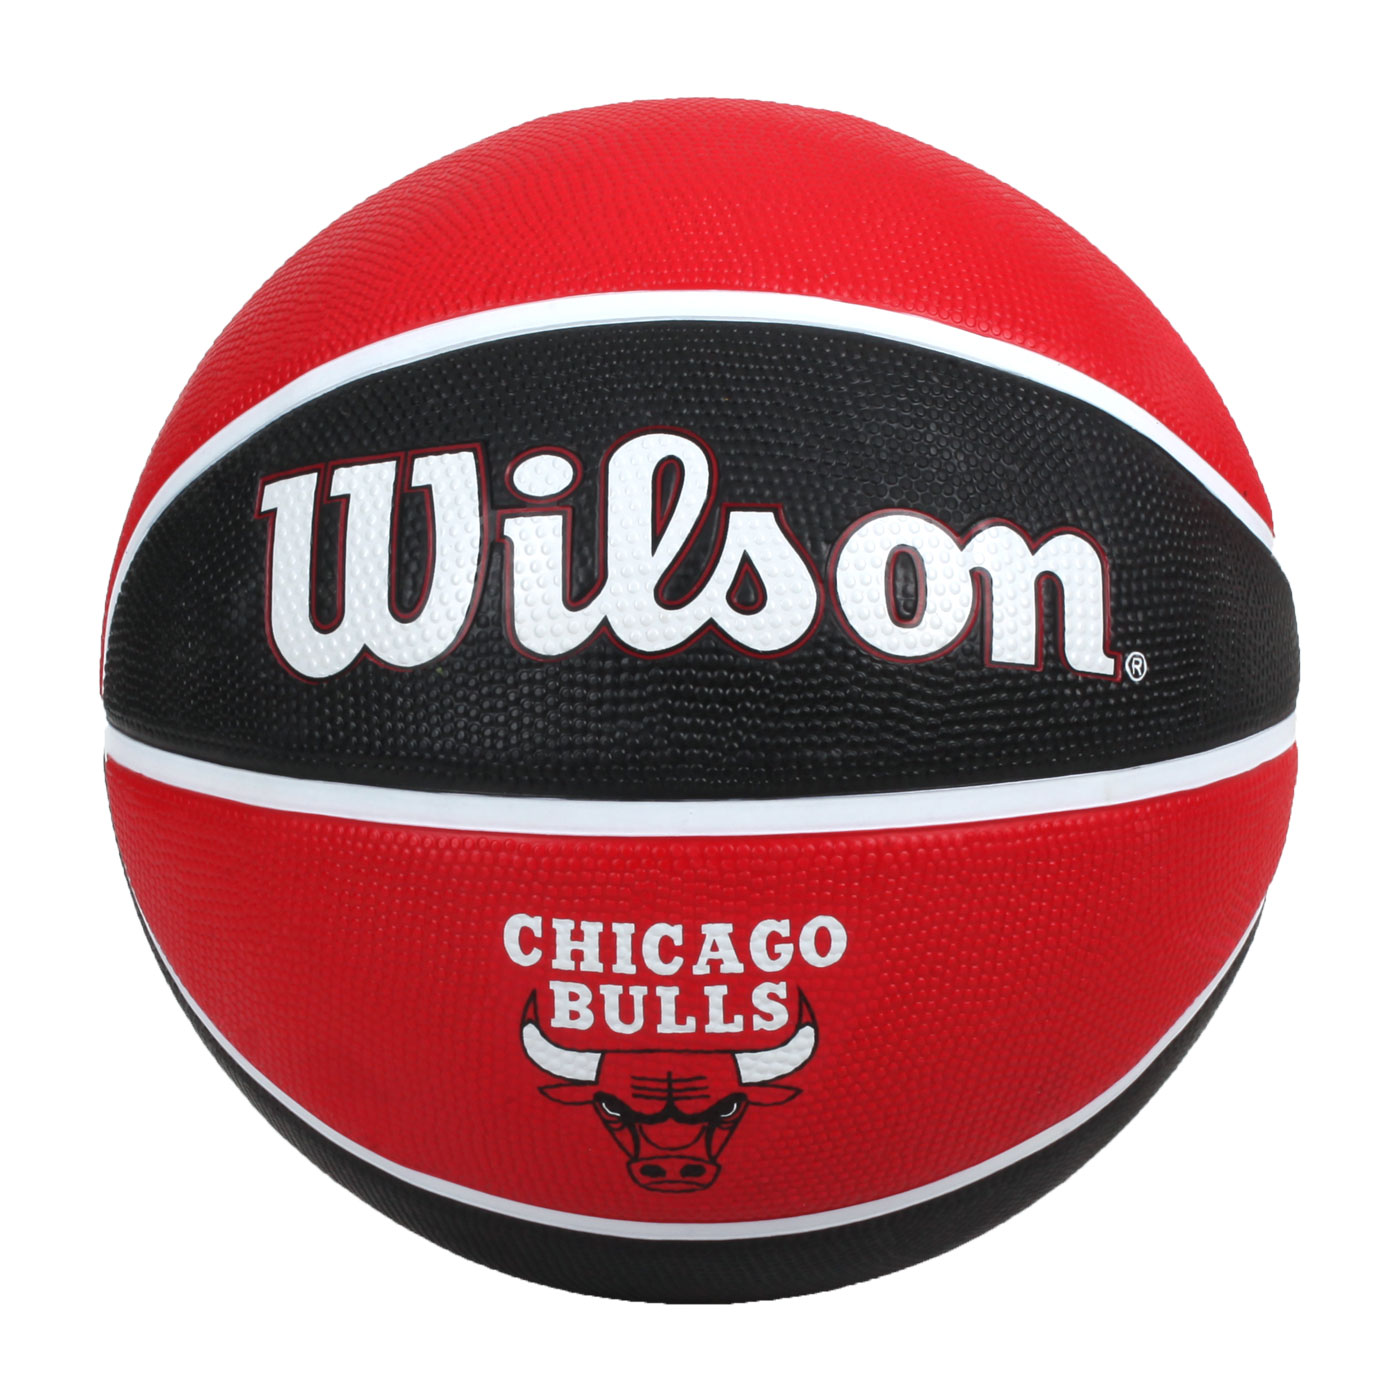 WILSON NBA隊徽系列21' 公牛隊橡膠籃球#7 WTB1300XBCHI